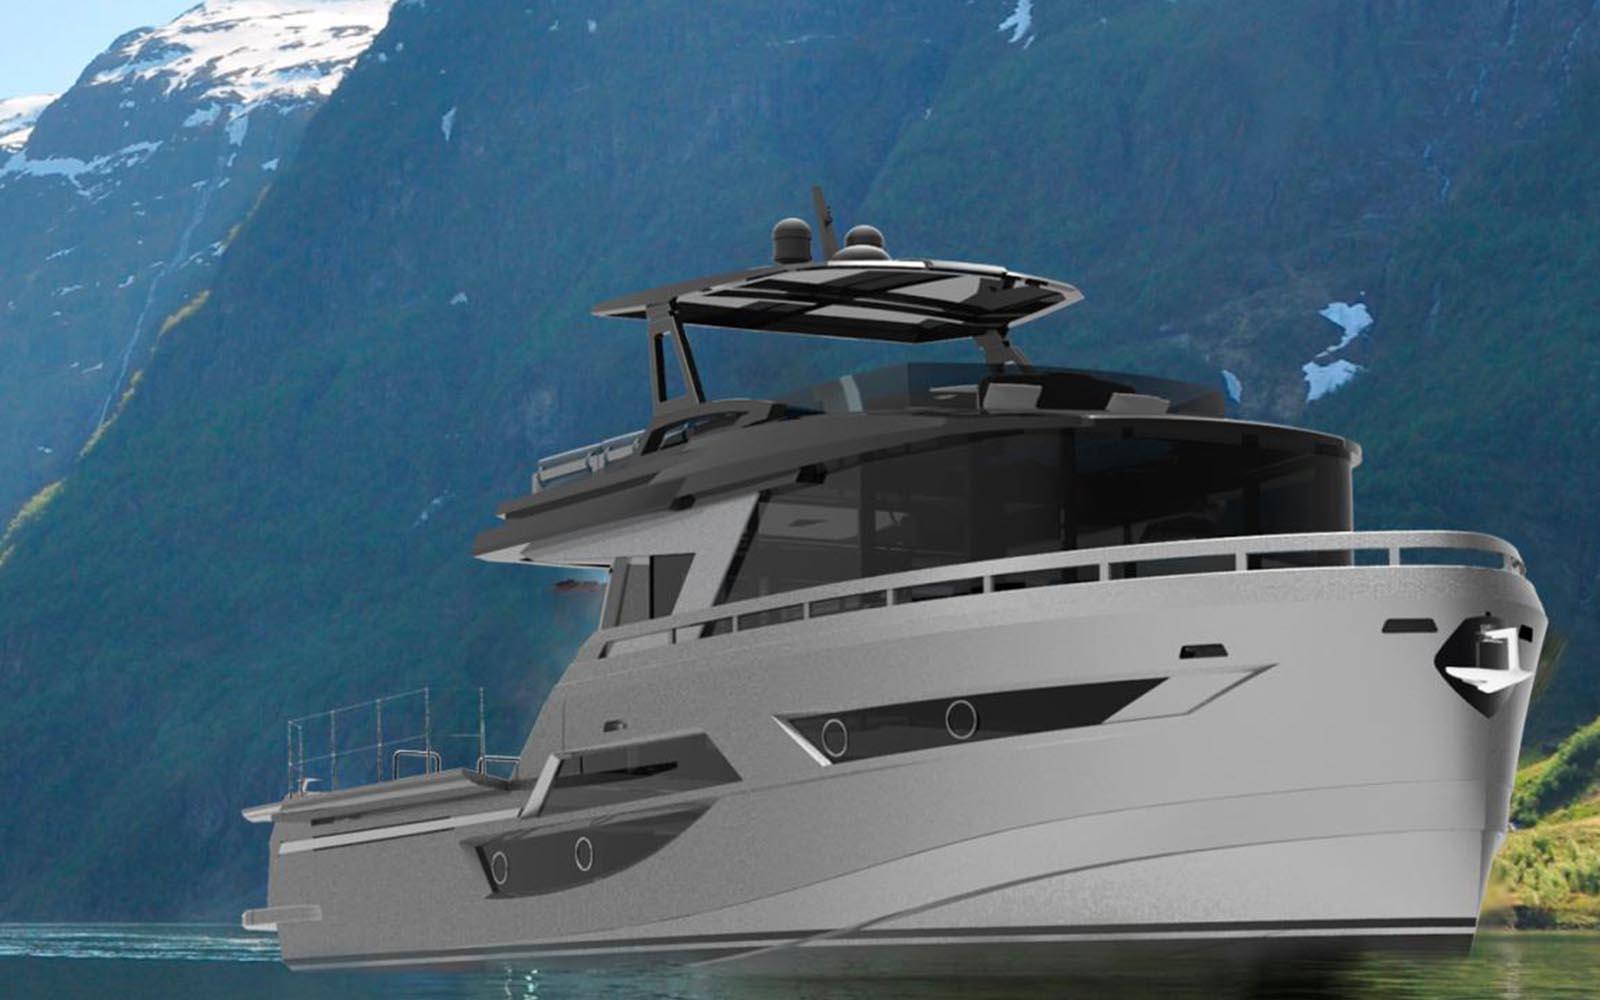 okean 50x explorer render - boat shopping